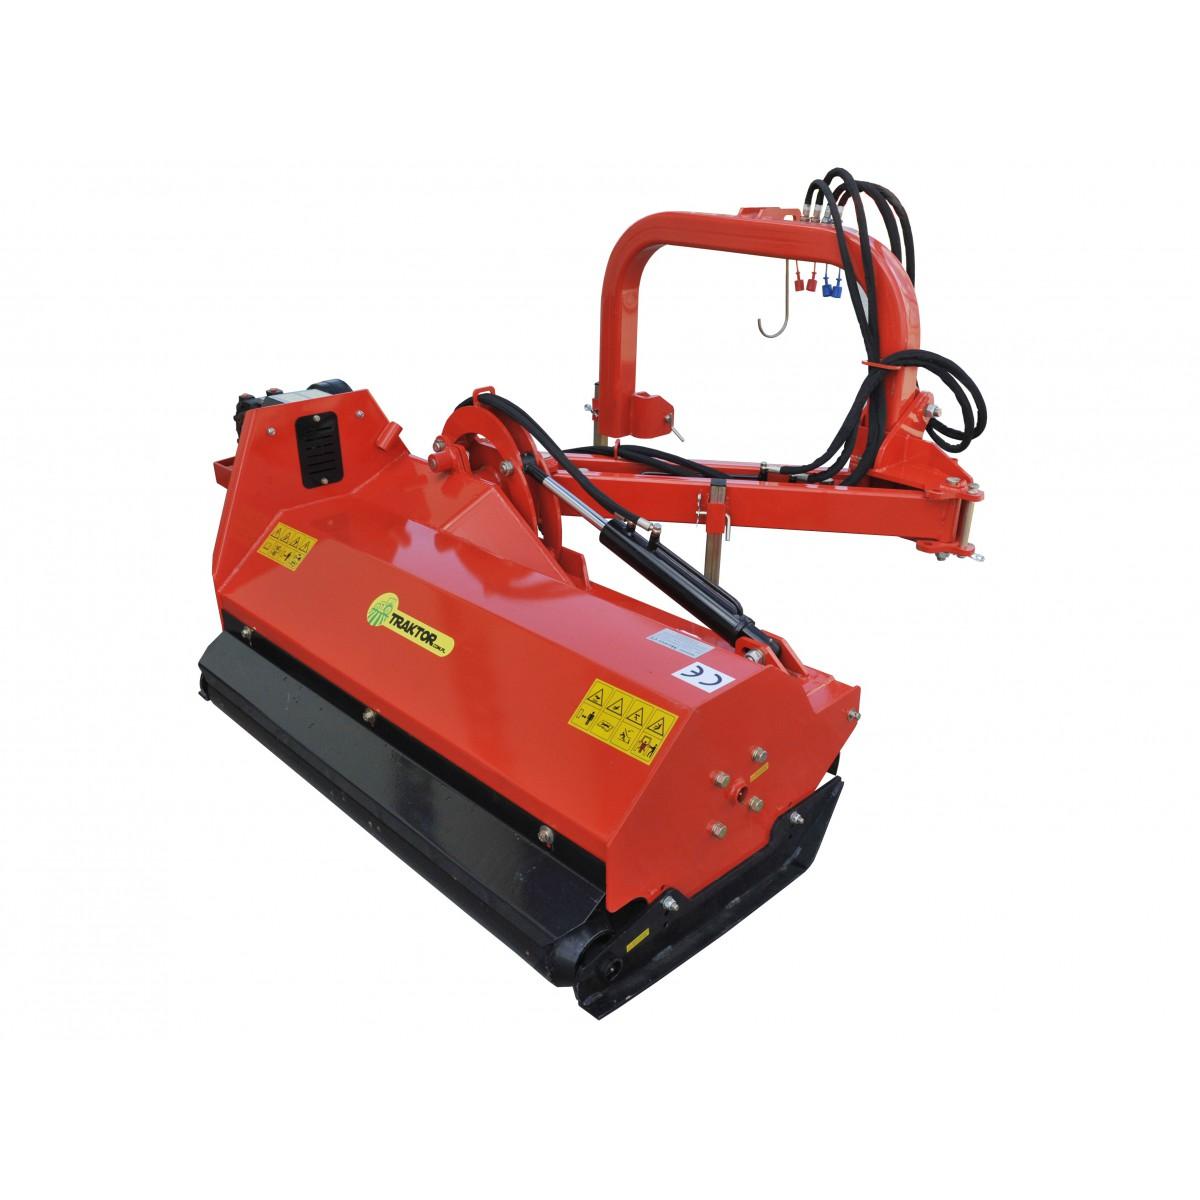 AGH 180 REAR-SIDE Flail Mower